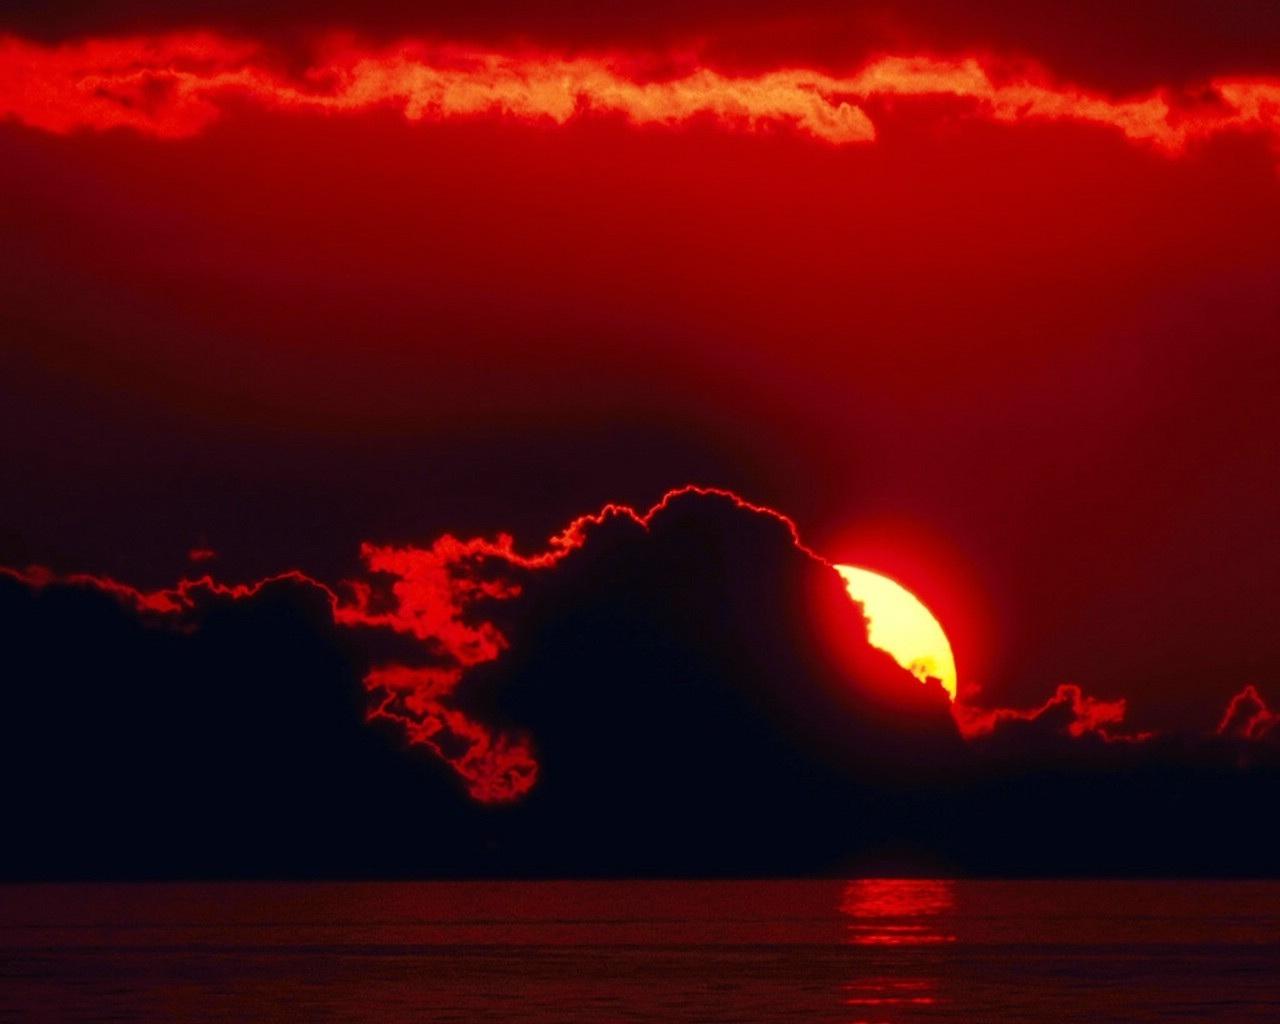 [Aventura]: Os Escolhidos 8589130500066-amazing-red-sky-wallpaper-hd